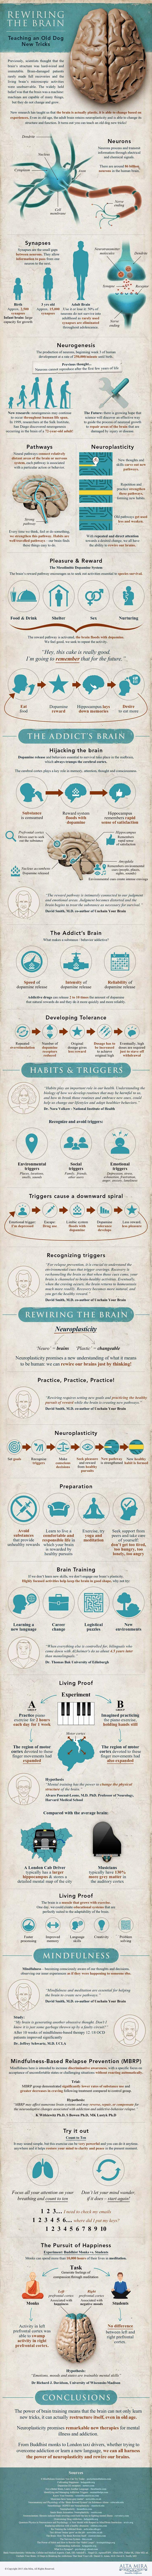 Neuroplasticity Rewiring the Brain Infographic. Medical